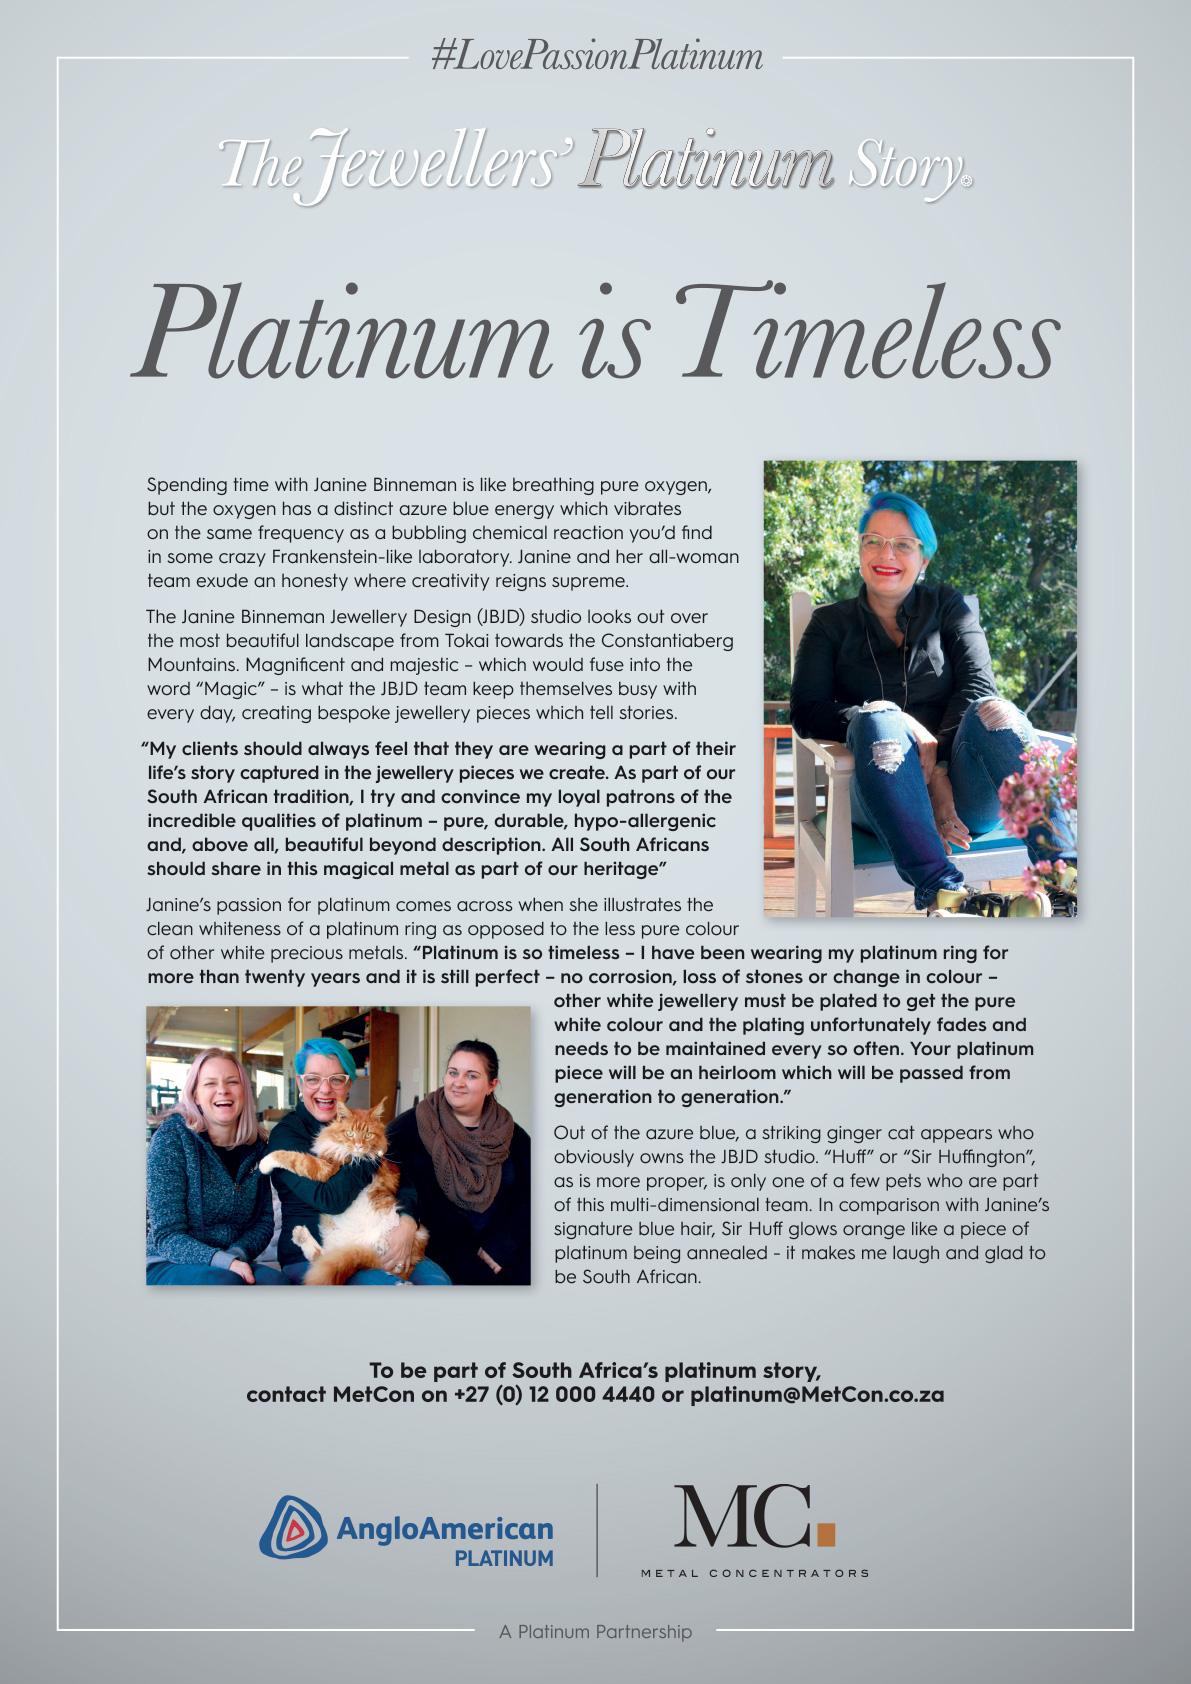 Platinum is Timeless